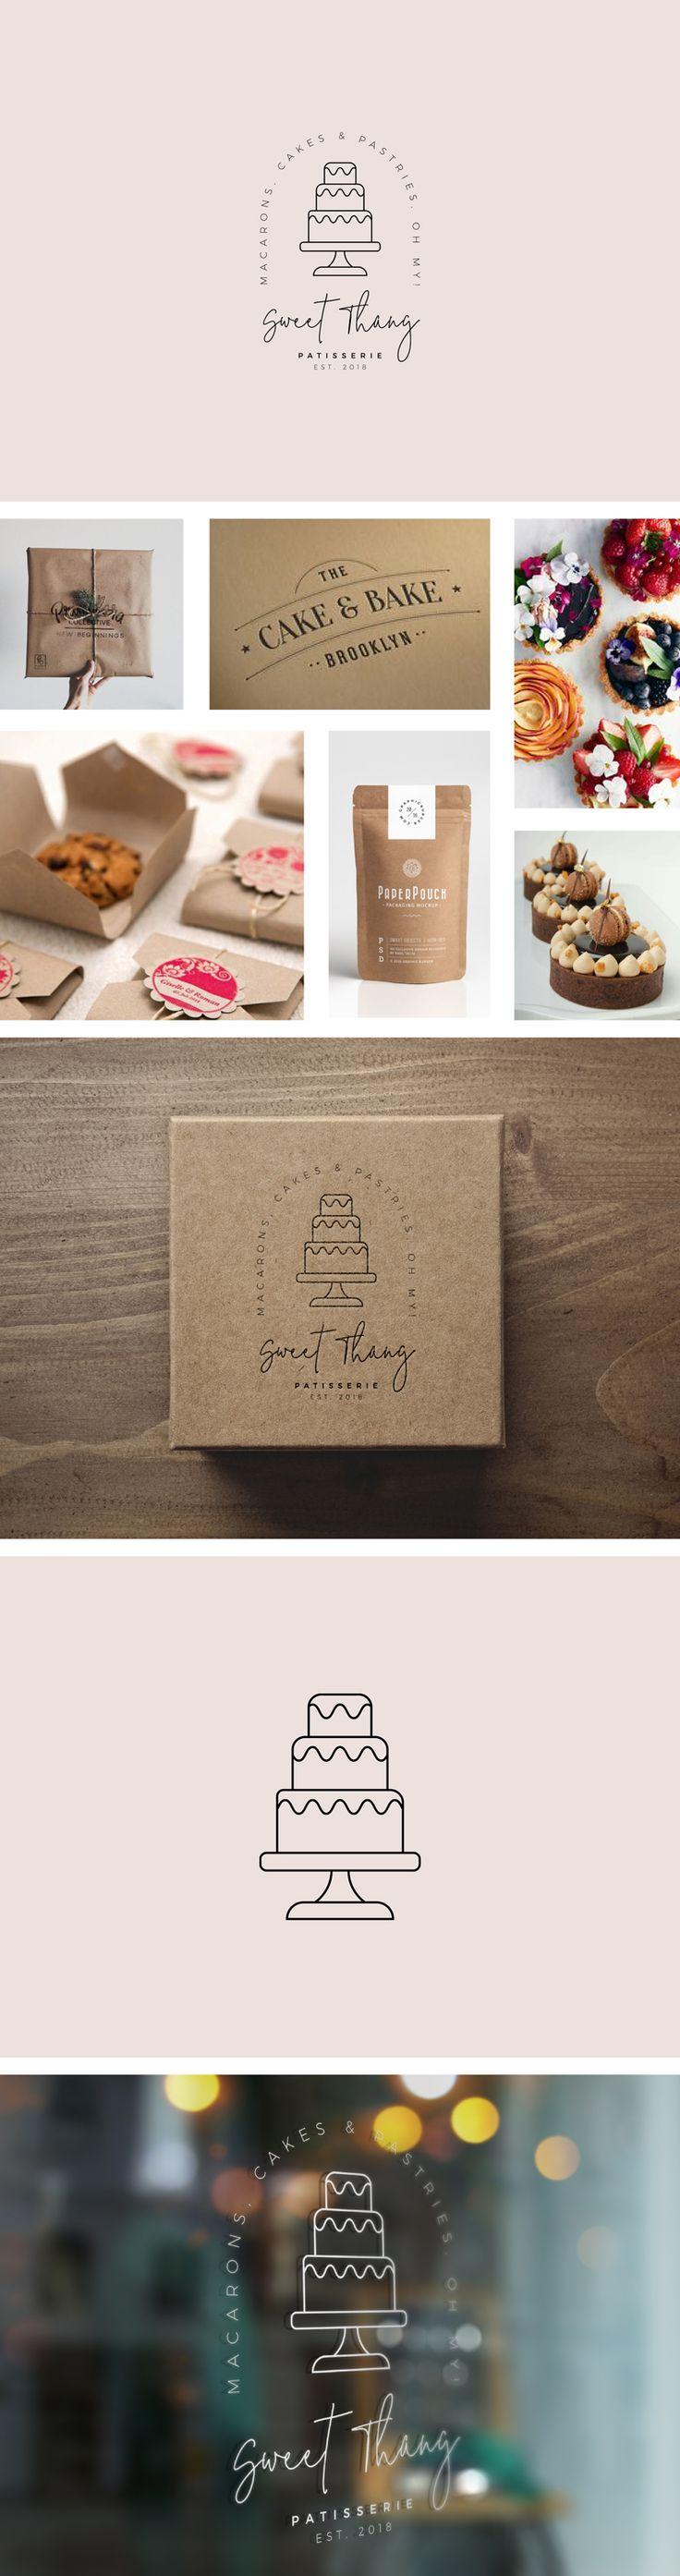 Sweet Thang Patisserie - logo design / brand identity